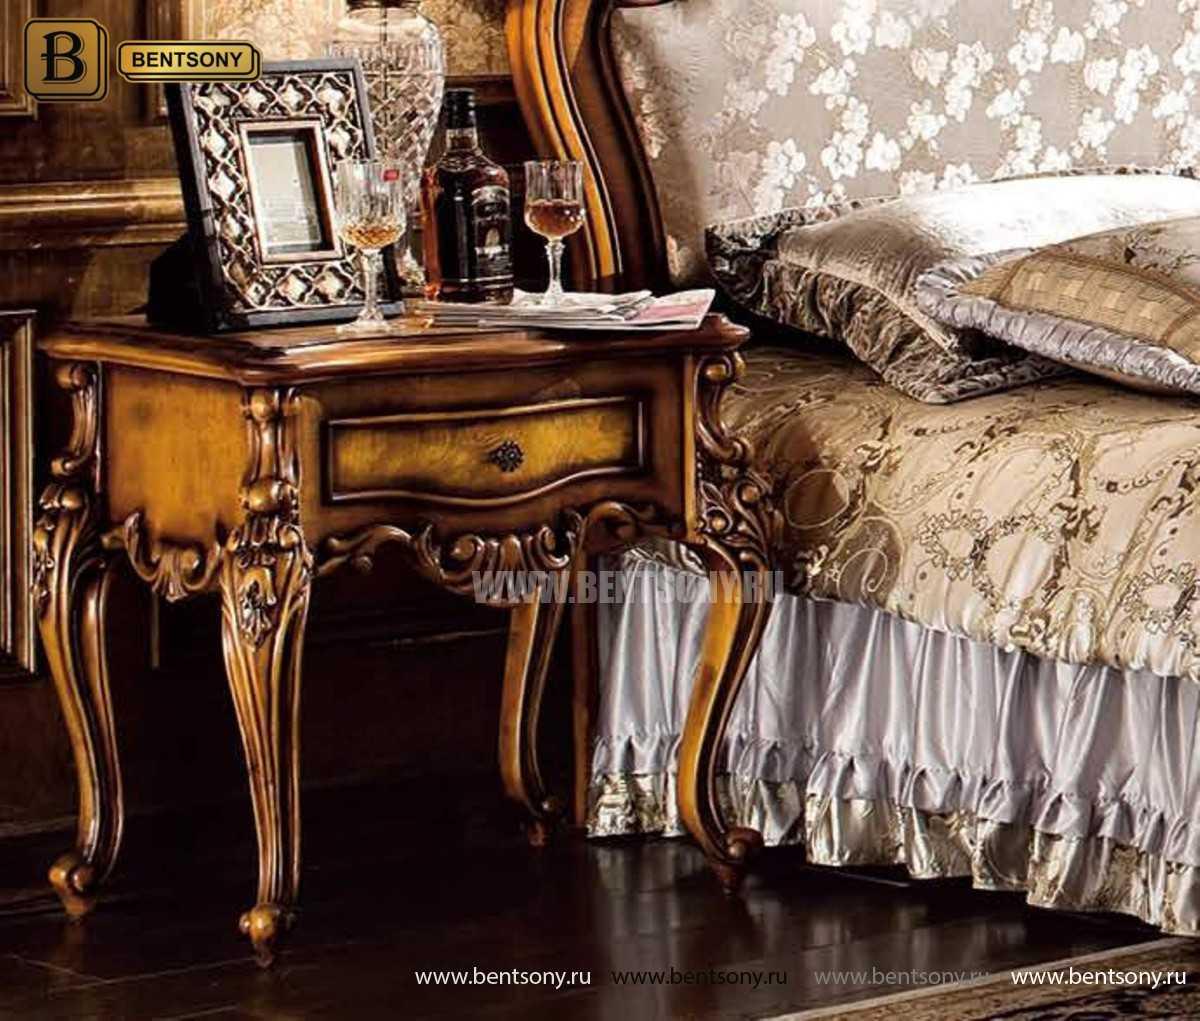 Спальня Дакота C (Классика, массив дерева) цена